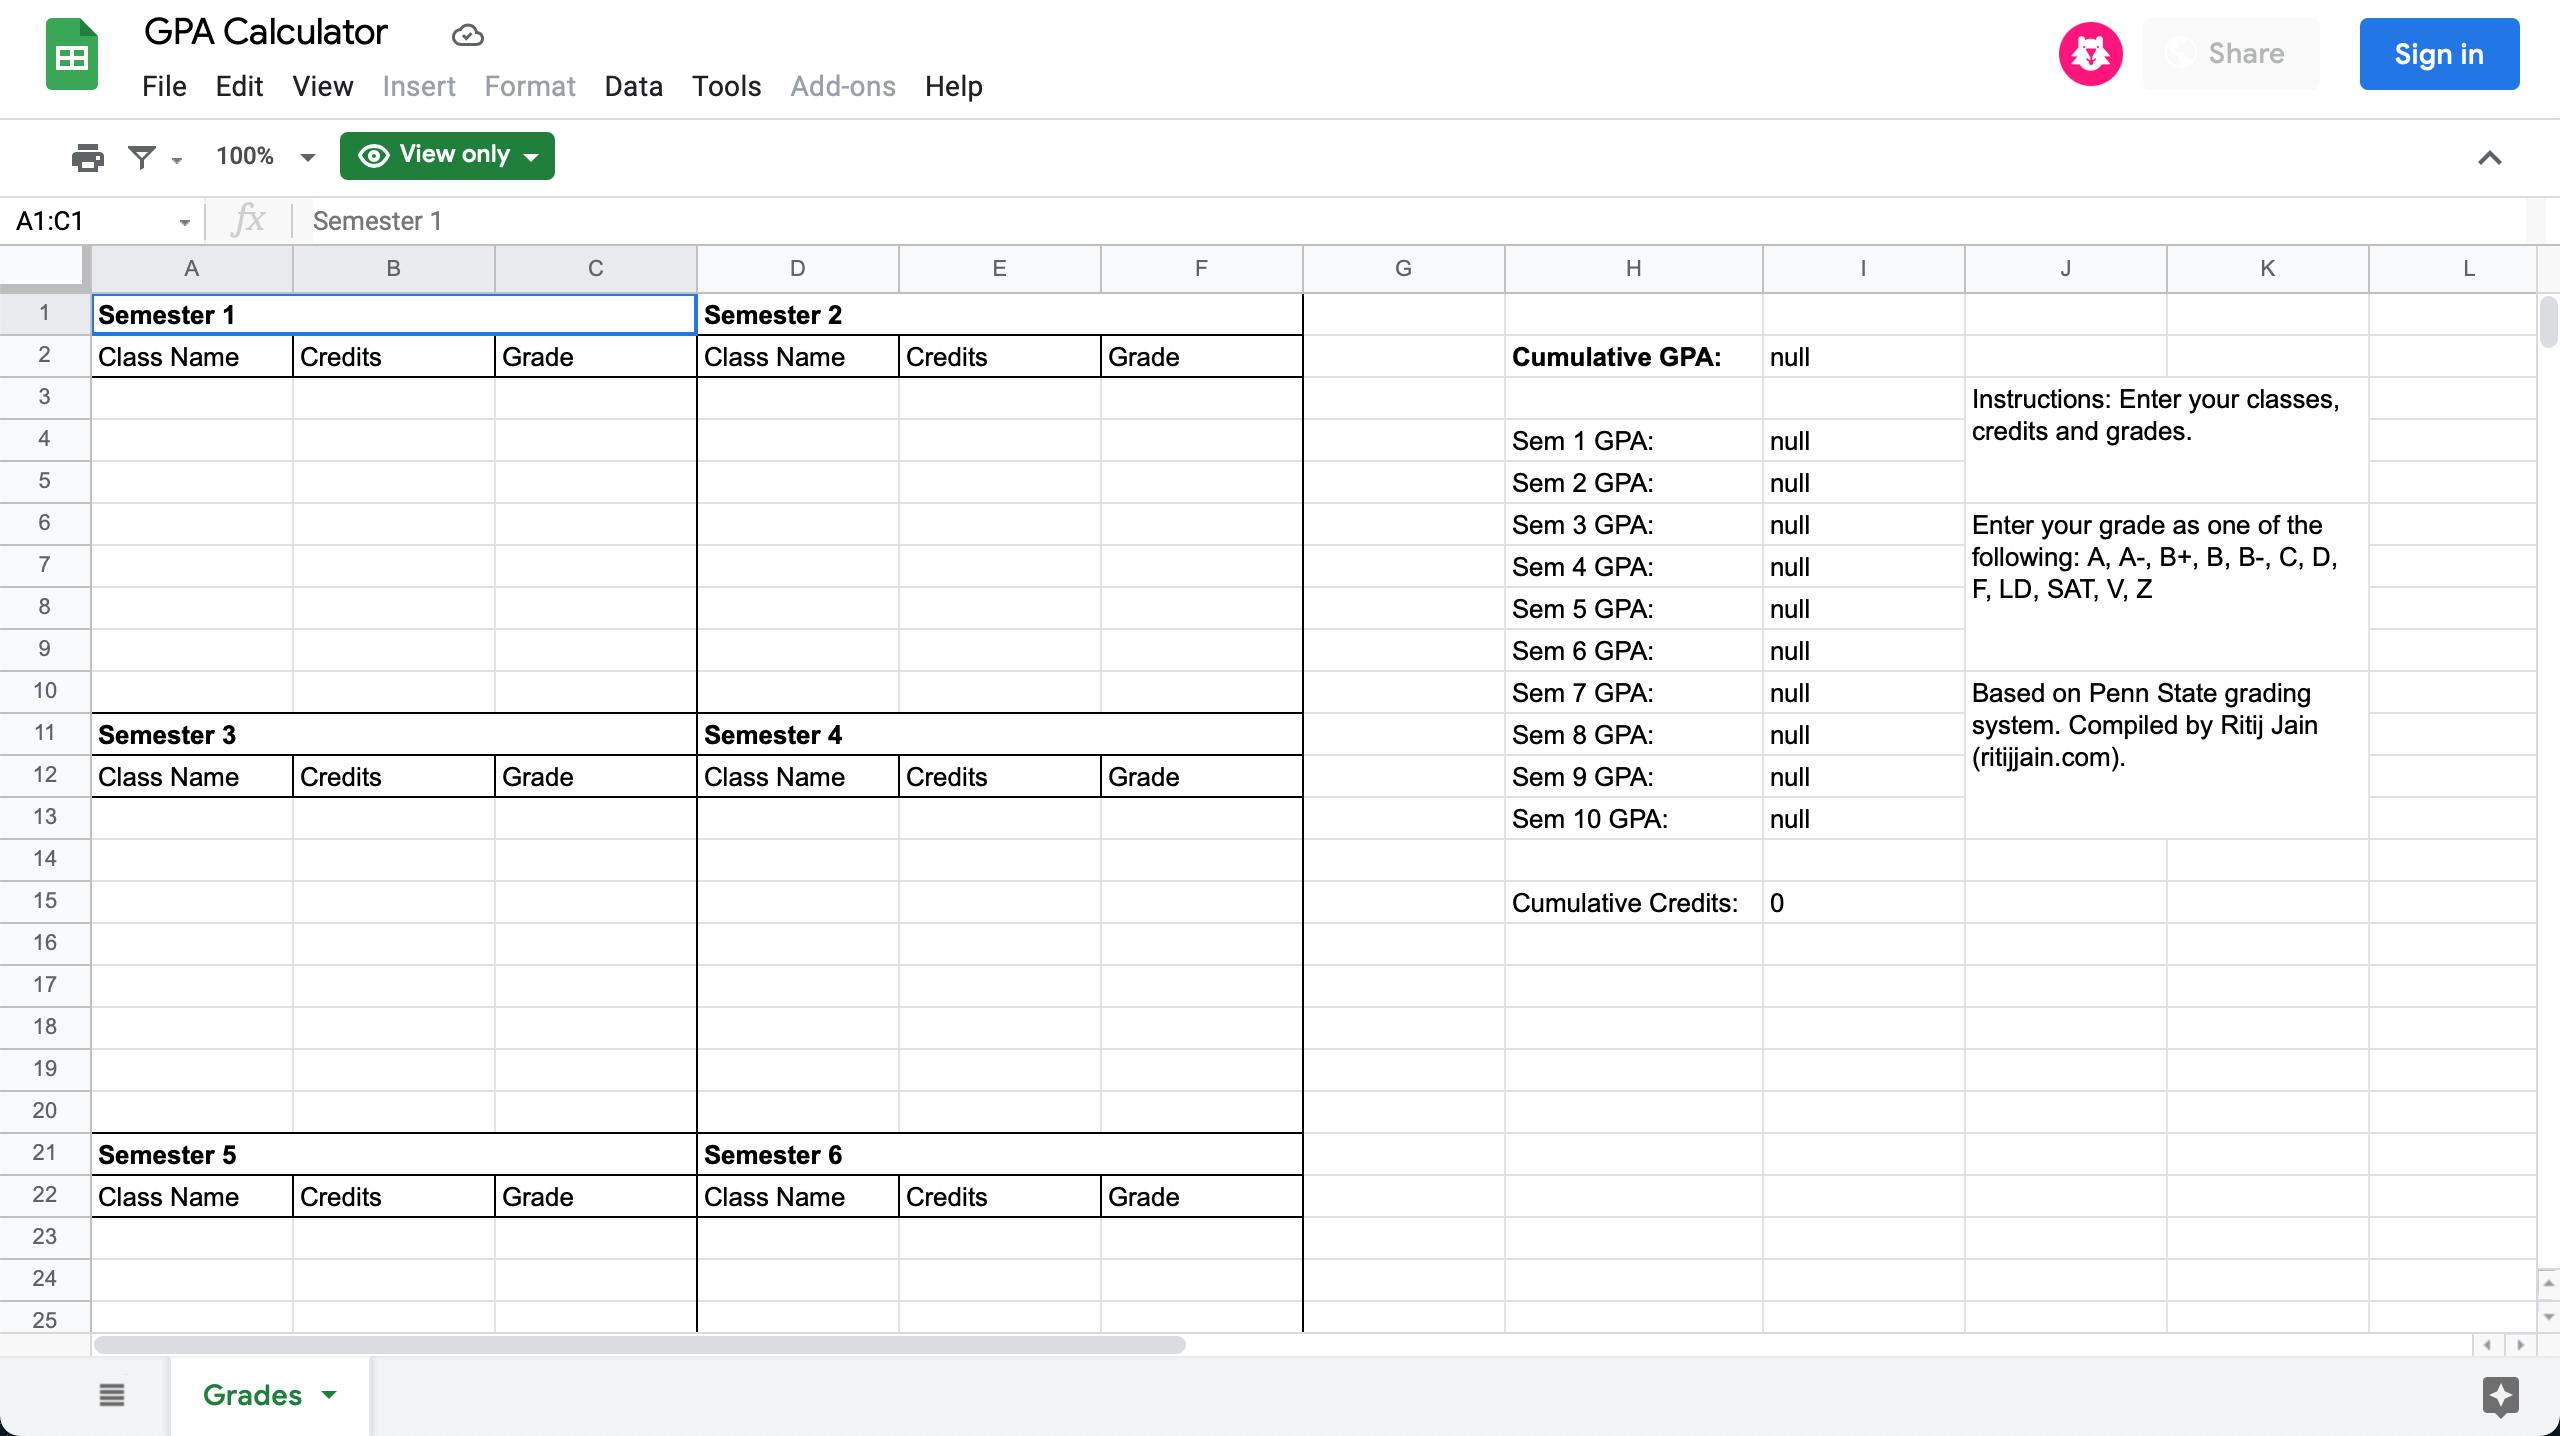 A screenshot of the GPA calculator spreadsheet.